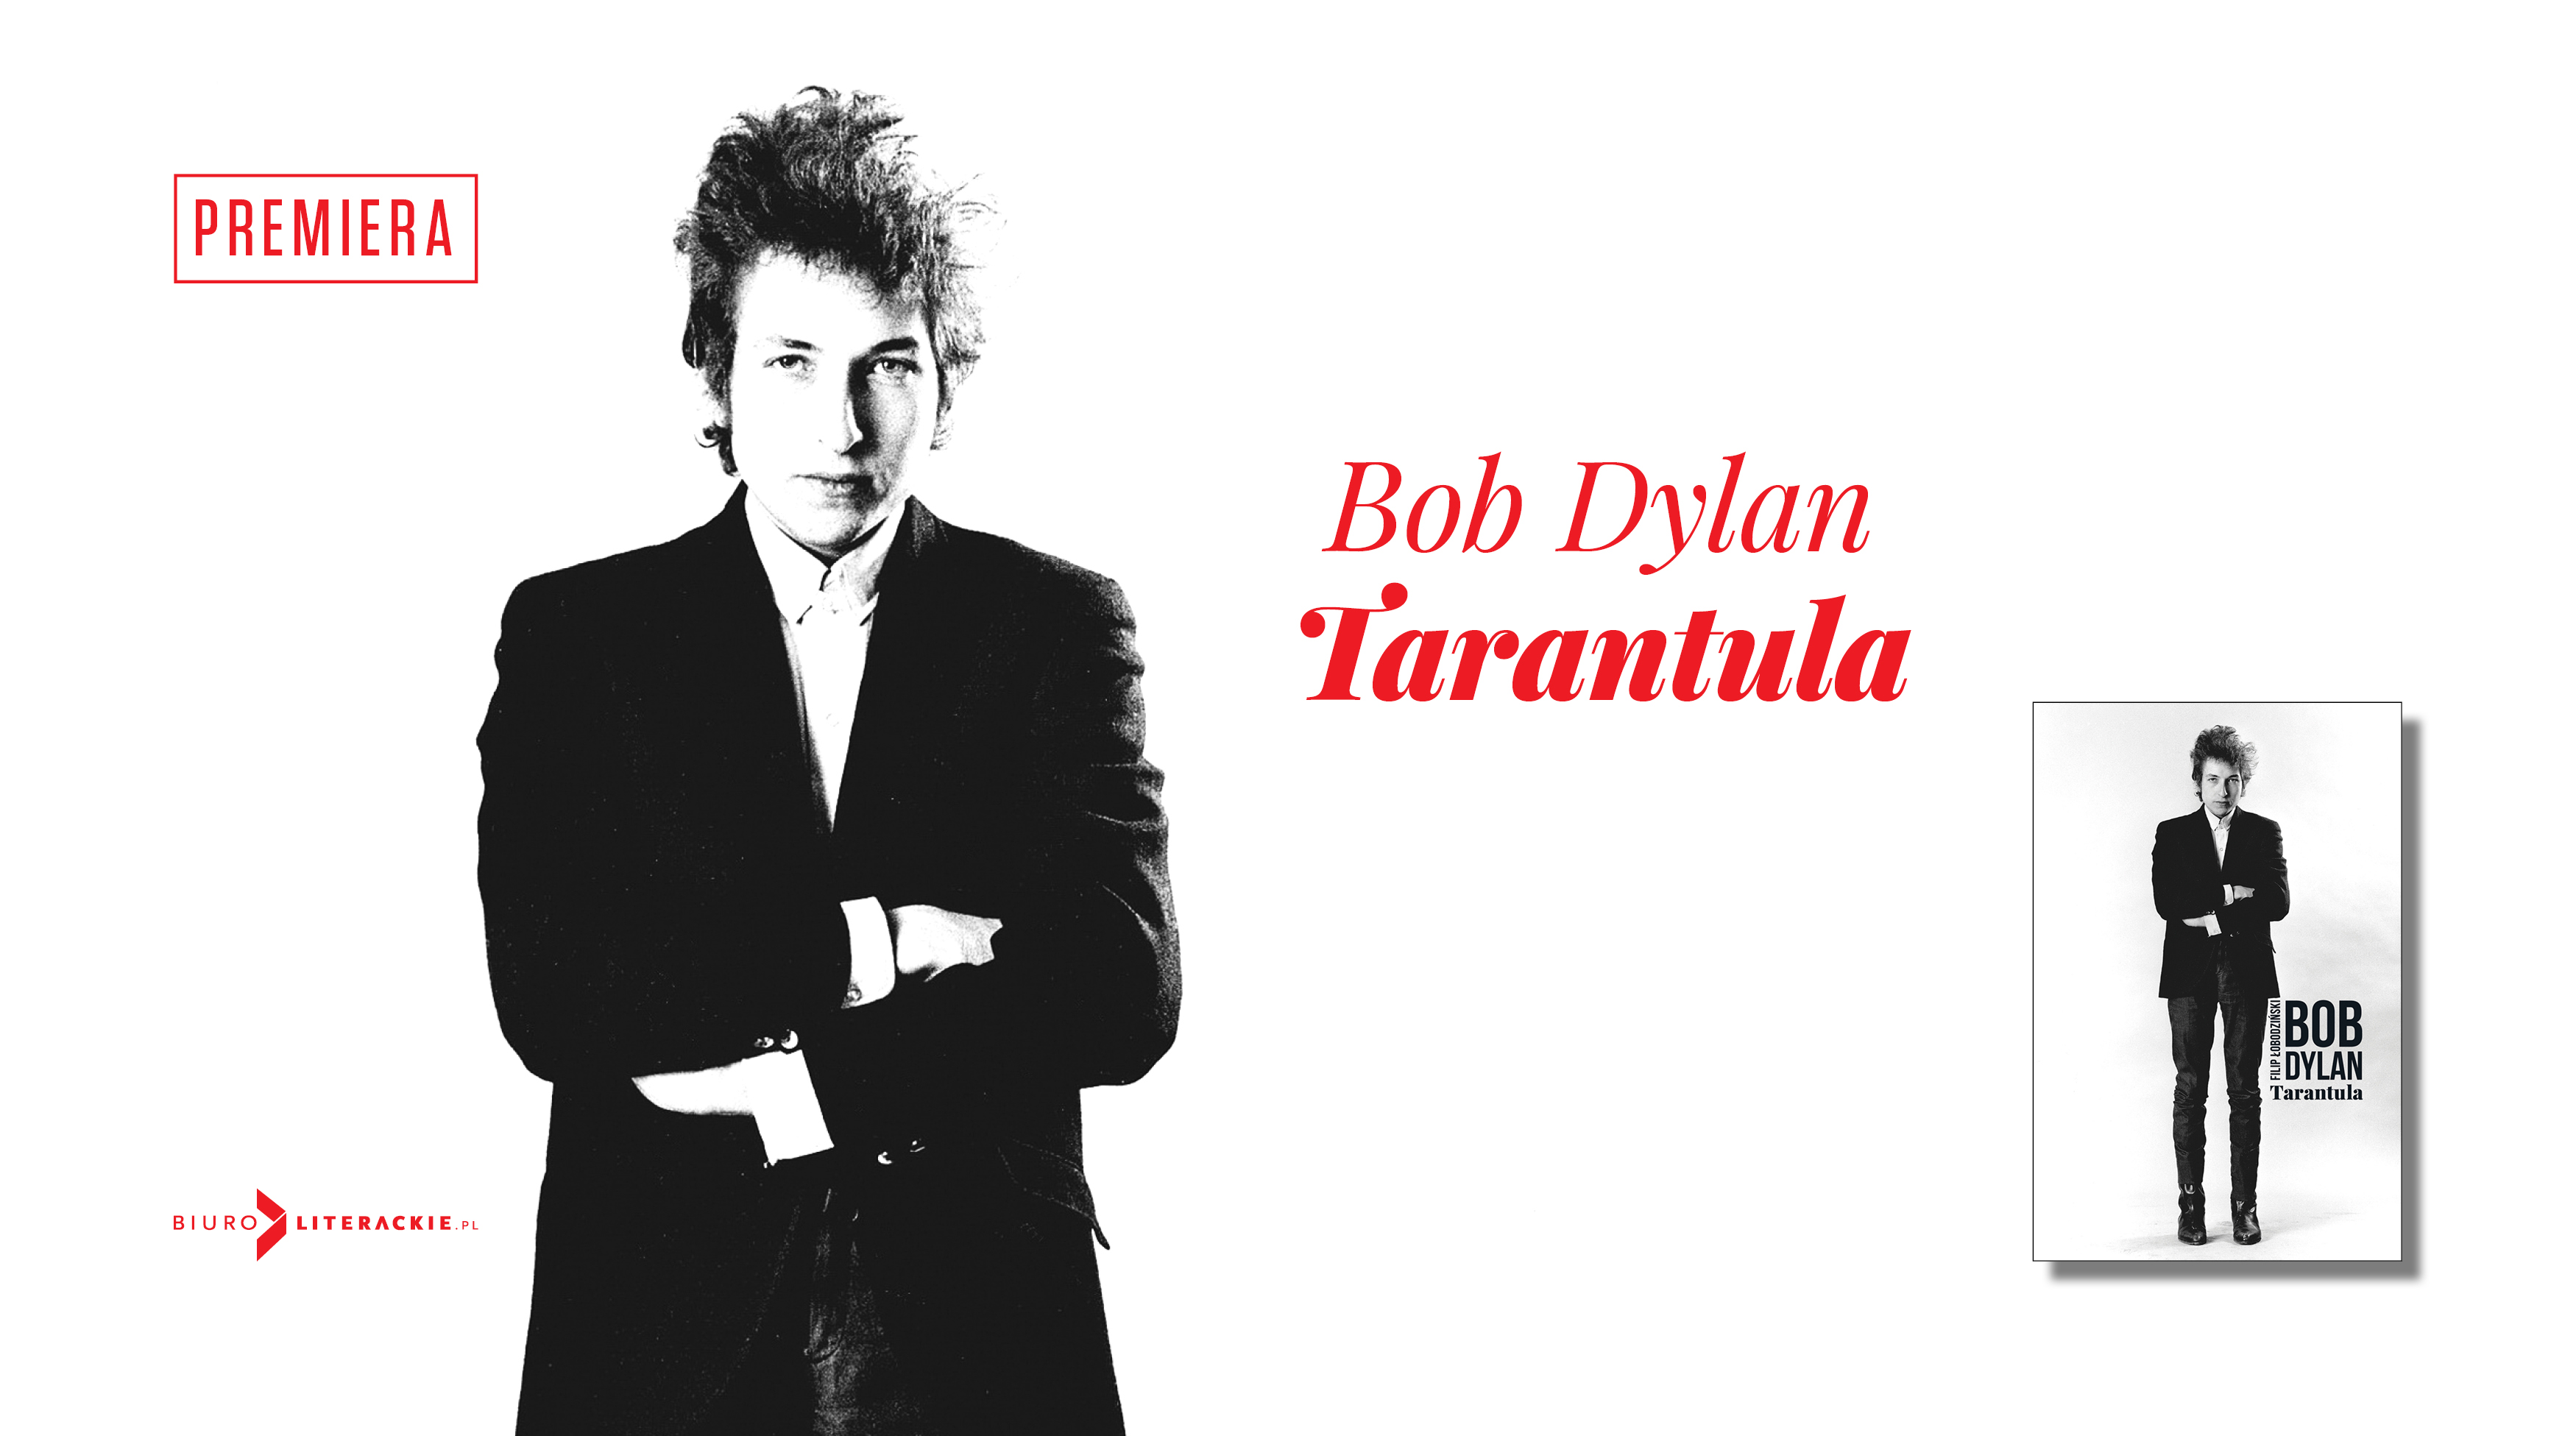 BL Img 2018.01.15 Bob DYLAN Tarantula__www